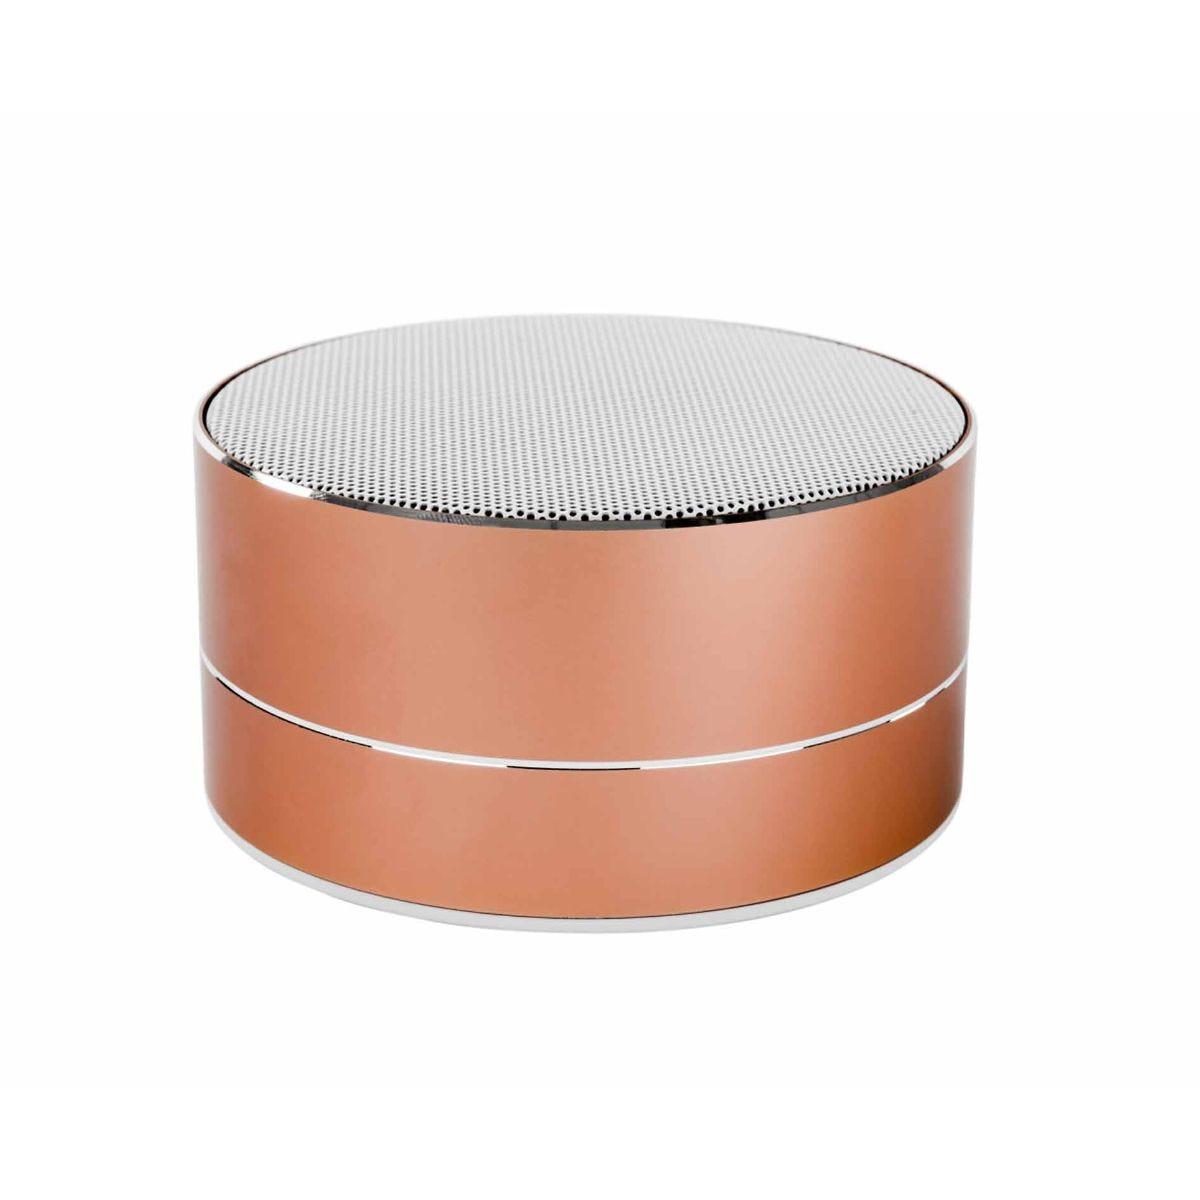 Image of Akai A58077 Mini DYNMX Bluetooth Speaker with Mic- Blush, Blush